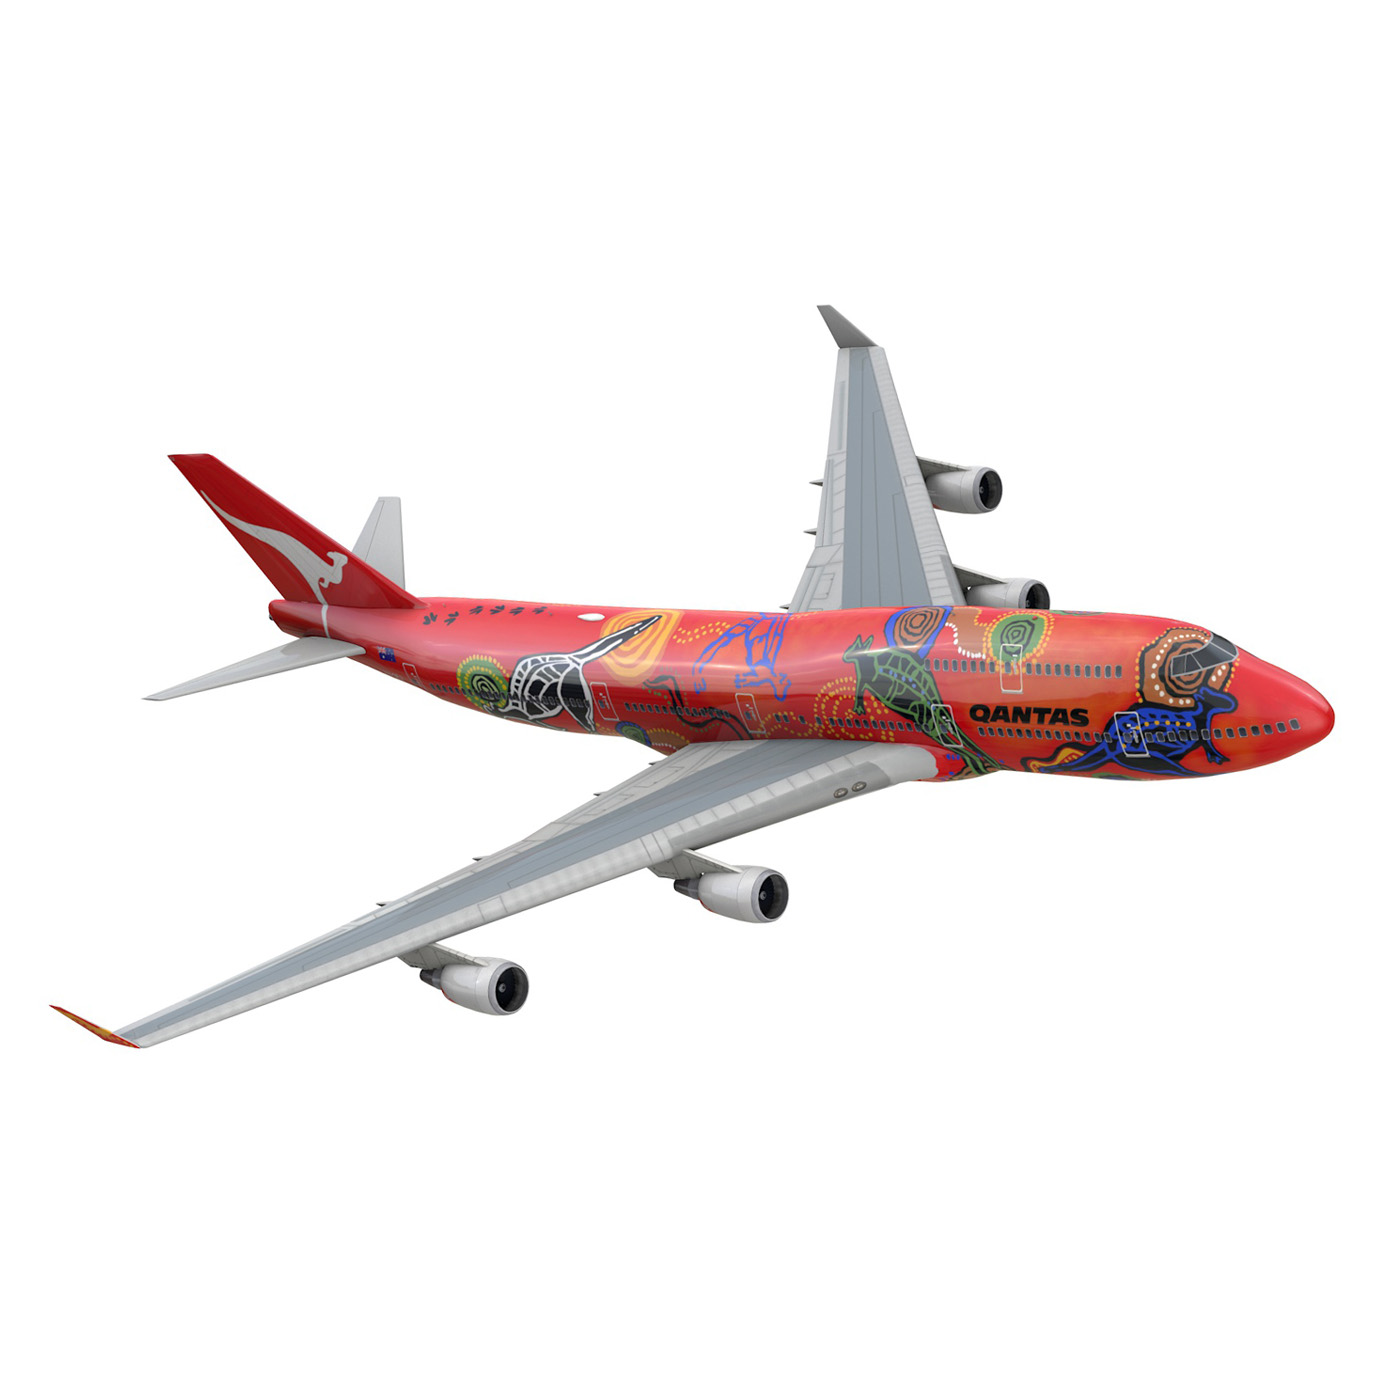 boeing 747 qantas wunala dreaming 3d model 3ds fbx c4d lwo obj 281786